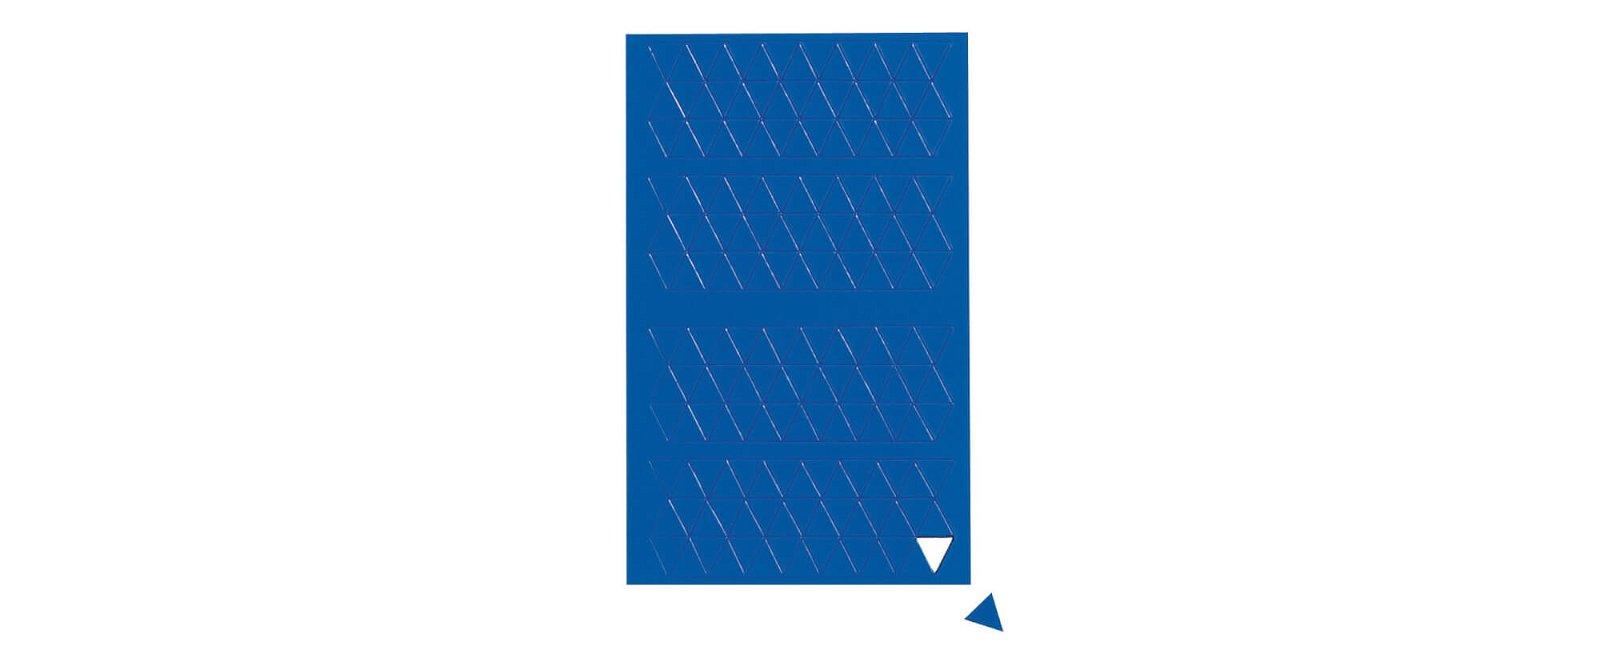 Magnetsymbole Dreieck,  180 St./Btl., blau